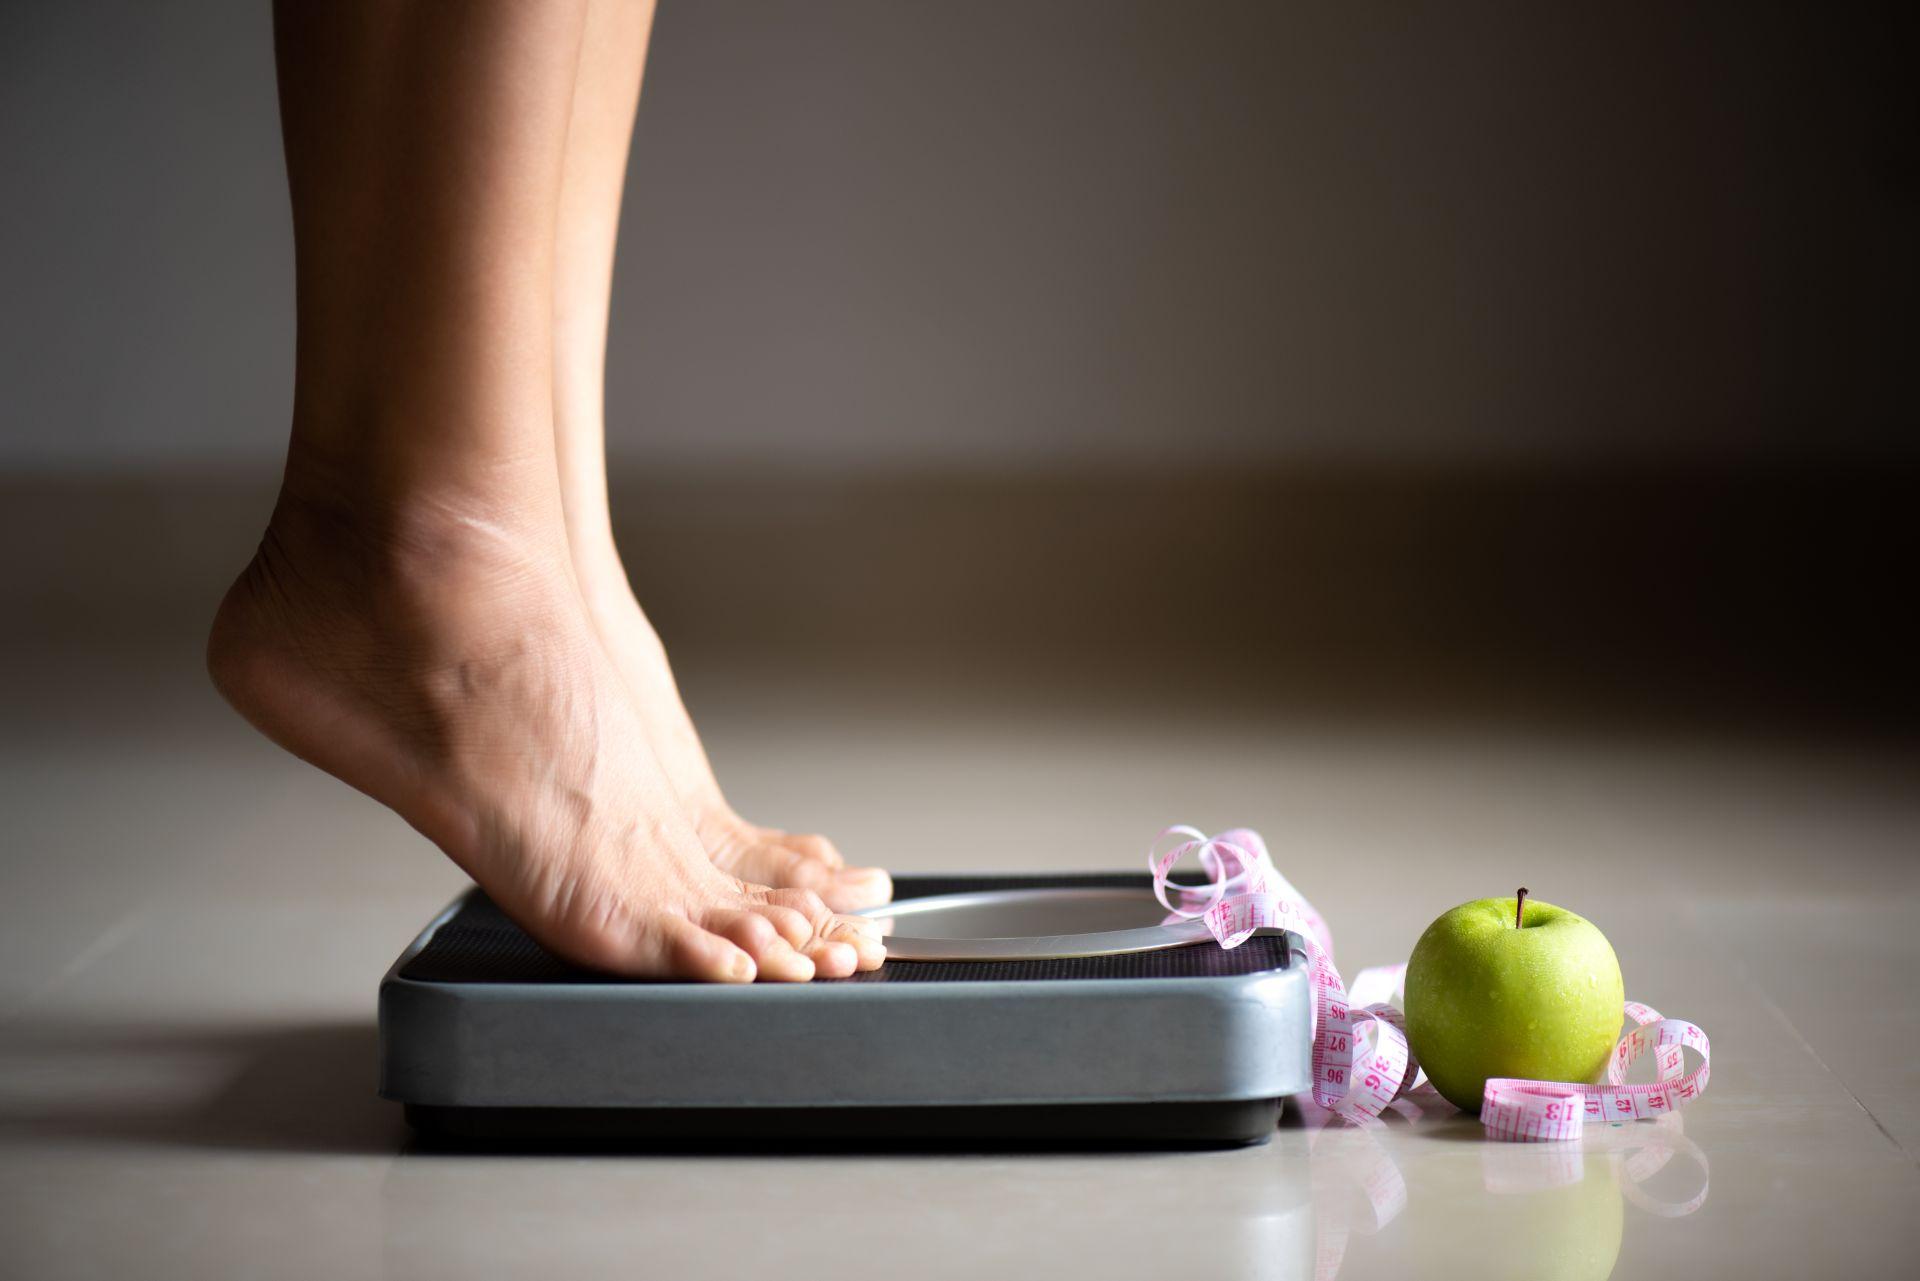 pierdere în greutate troy ny